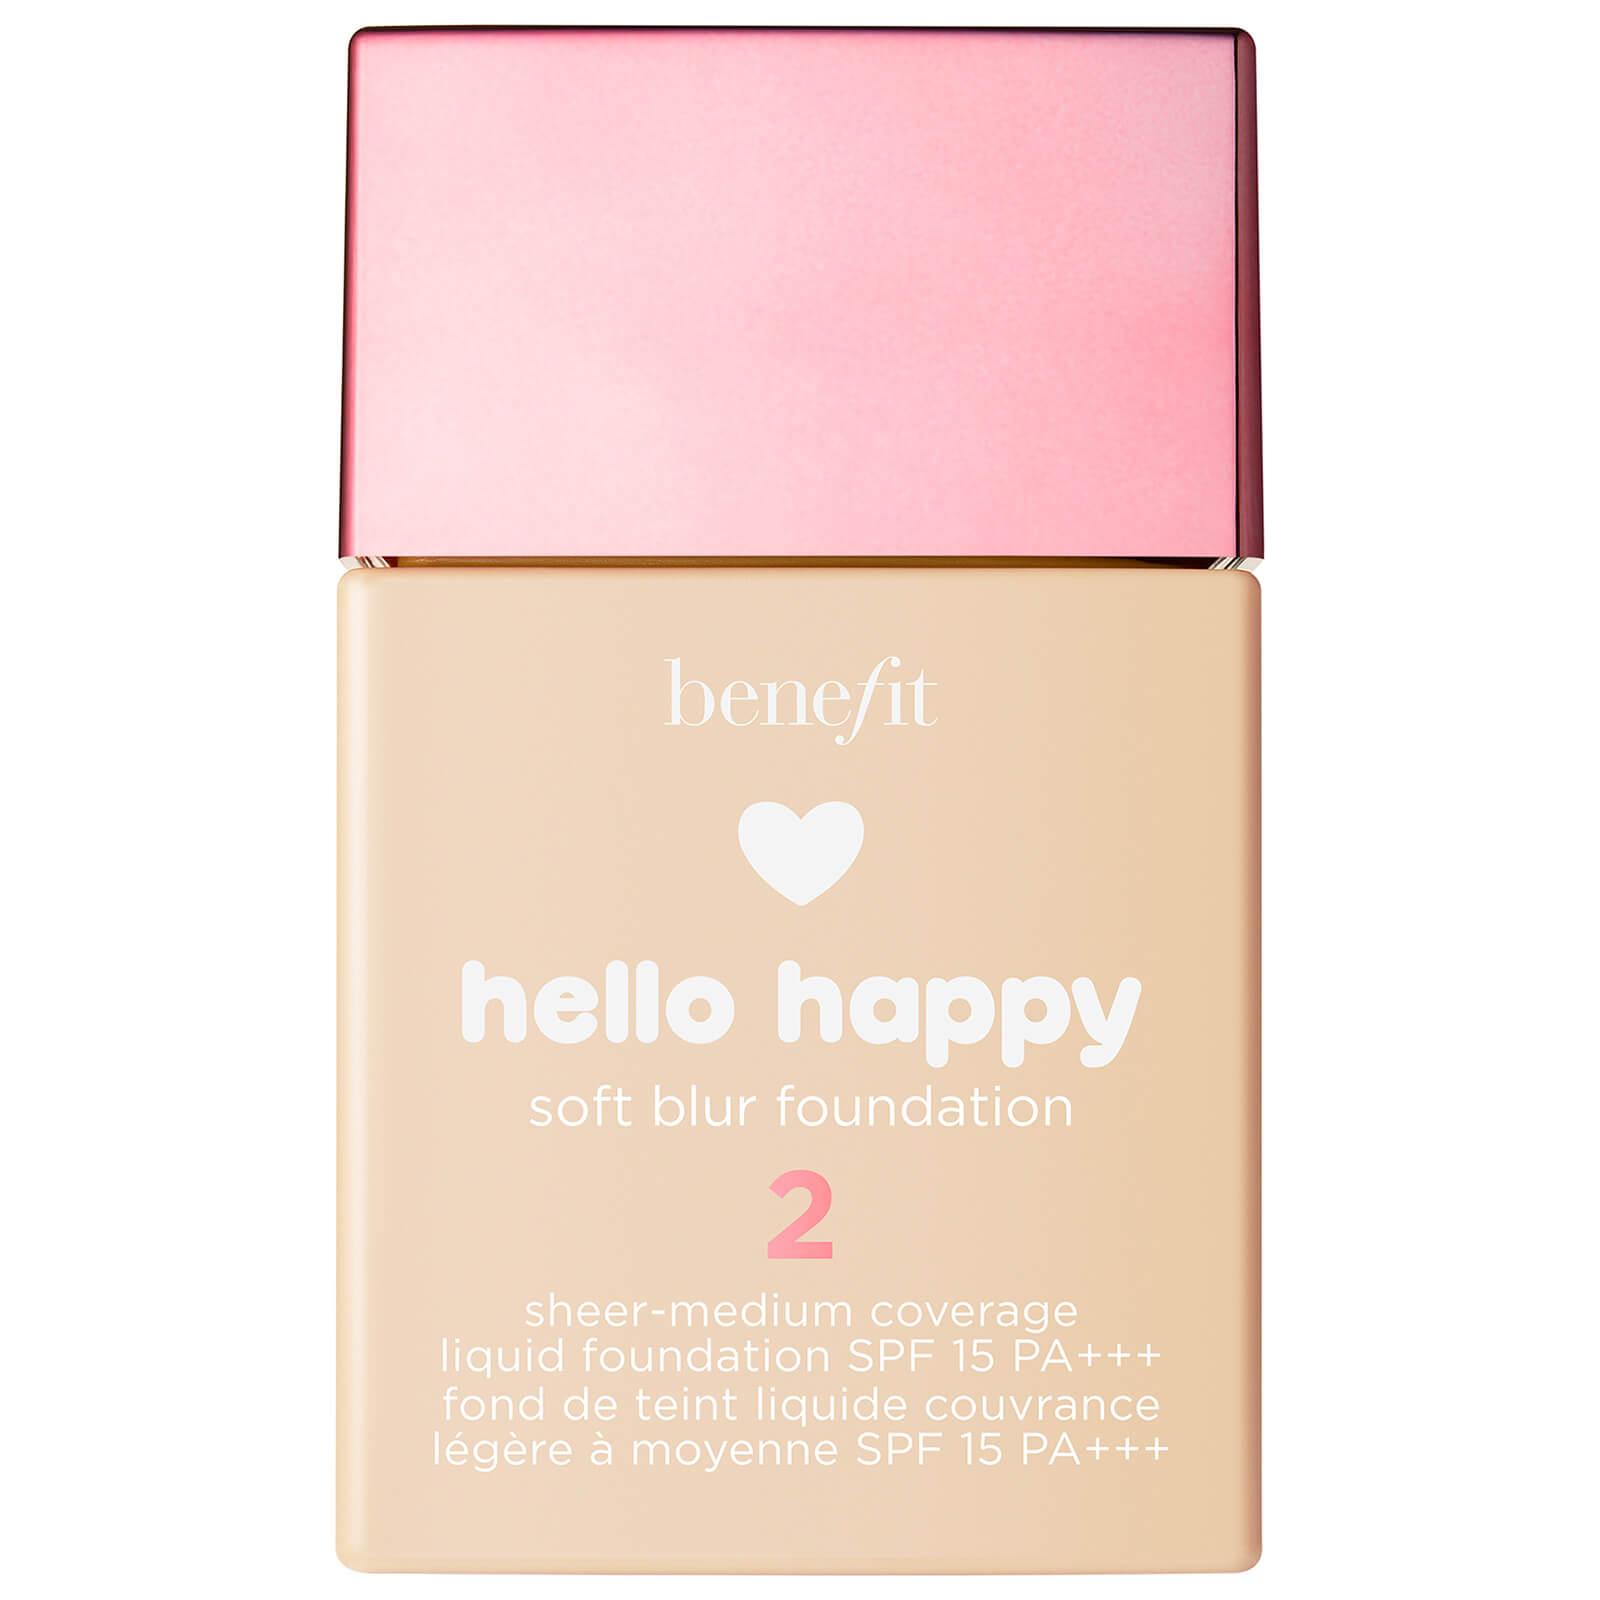 Benefit Hello Happy Soft Blur Foundation (Various Shades) - 2